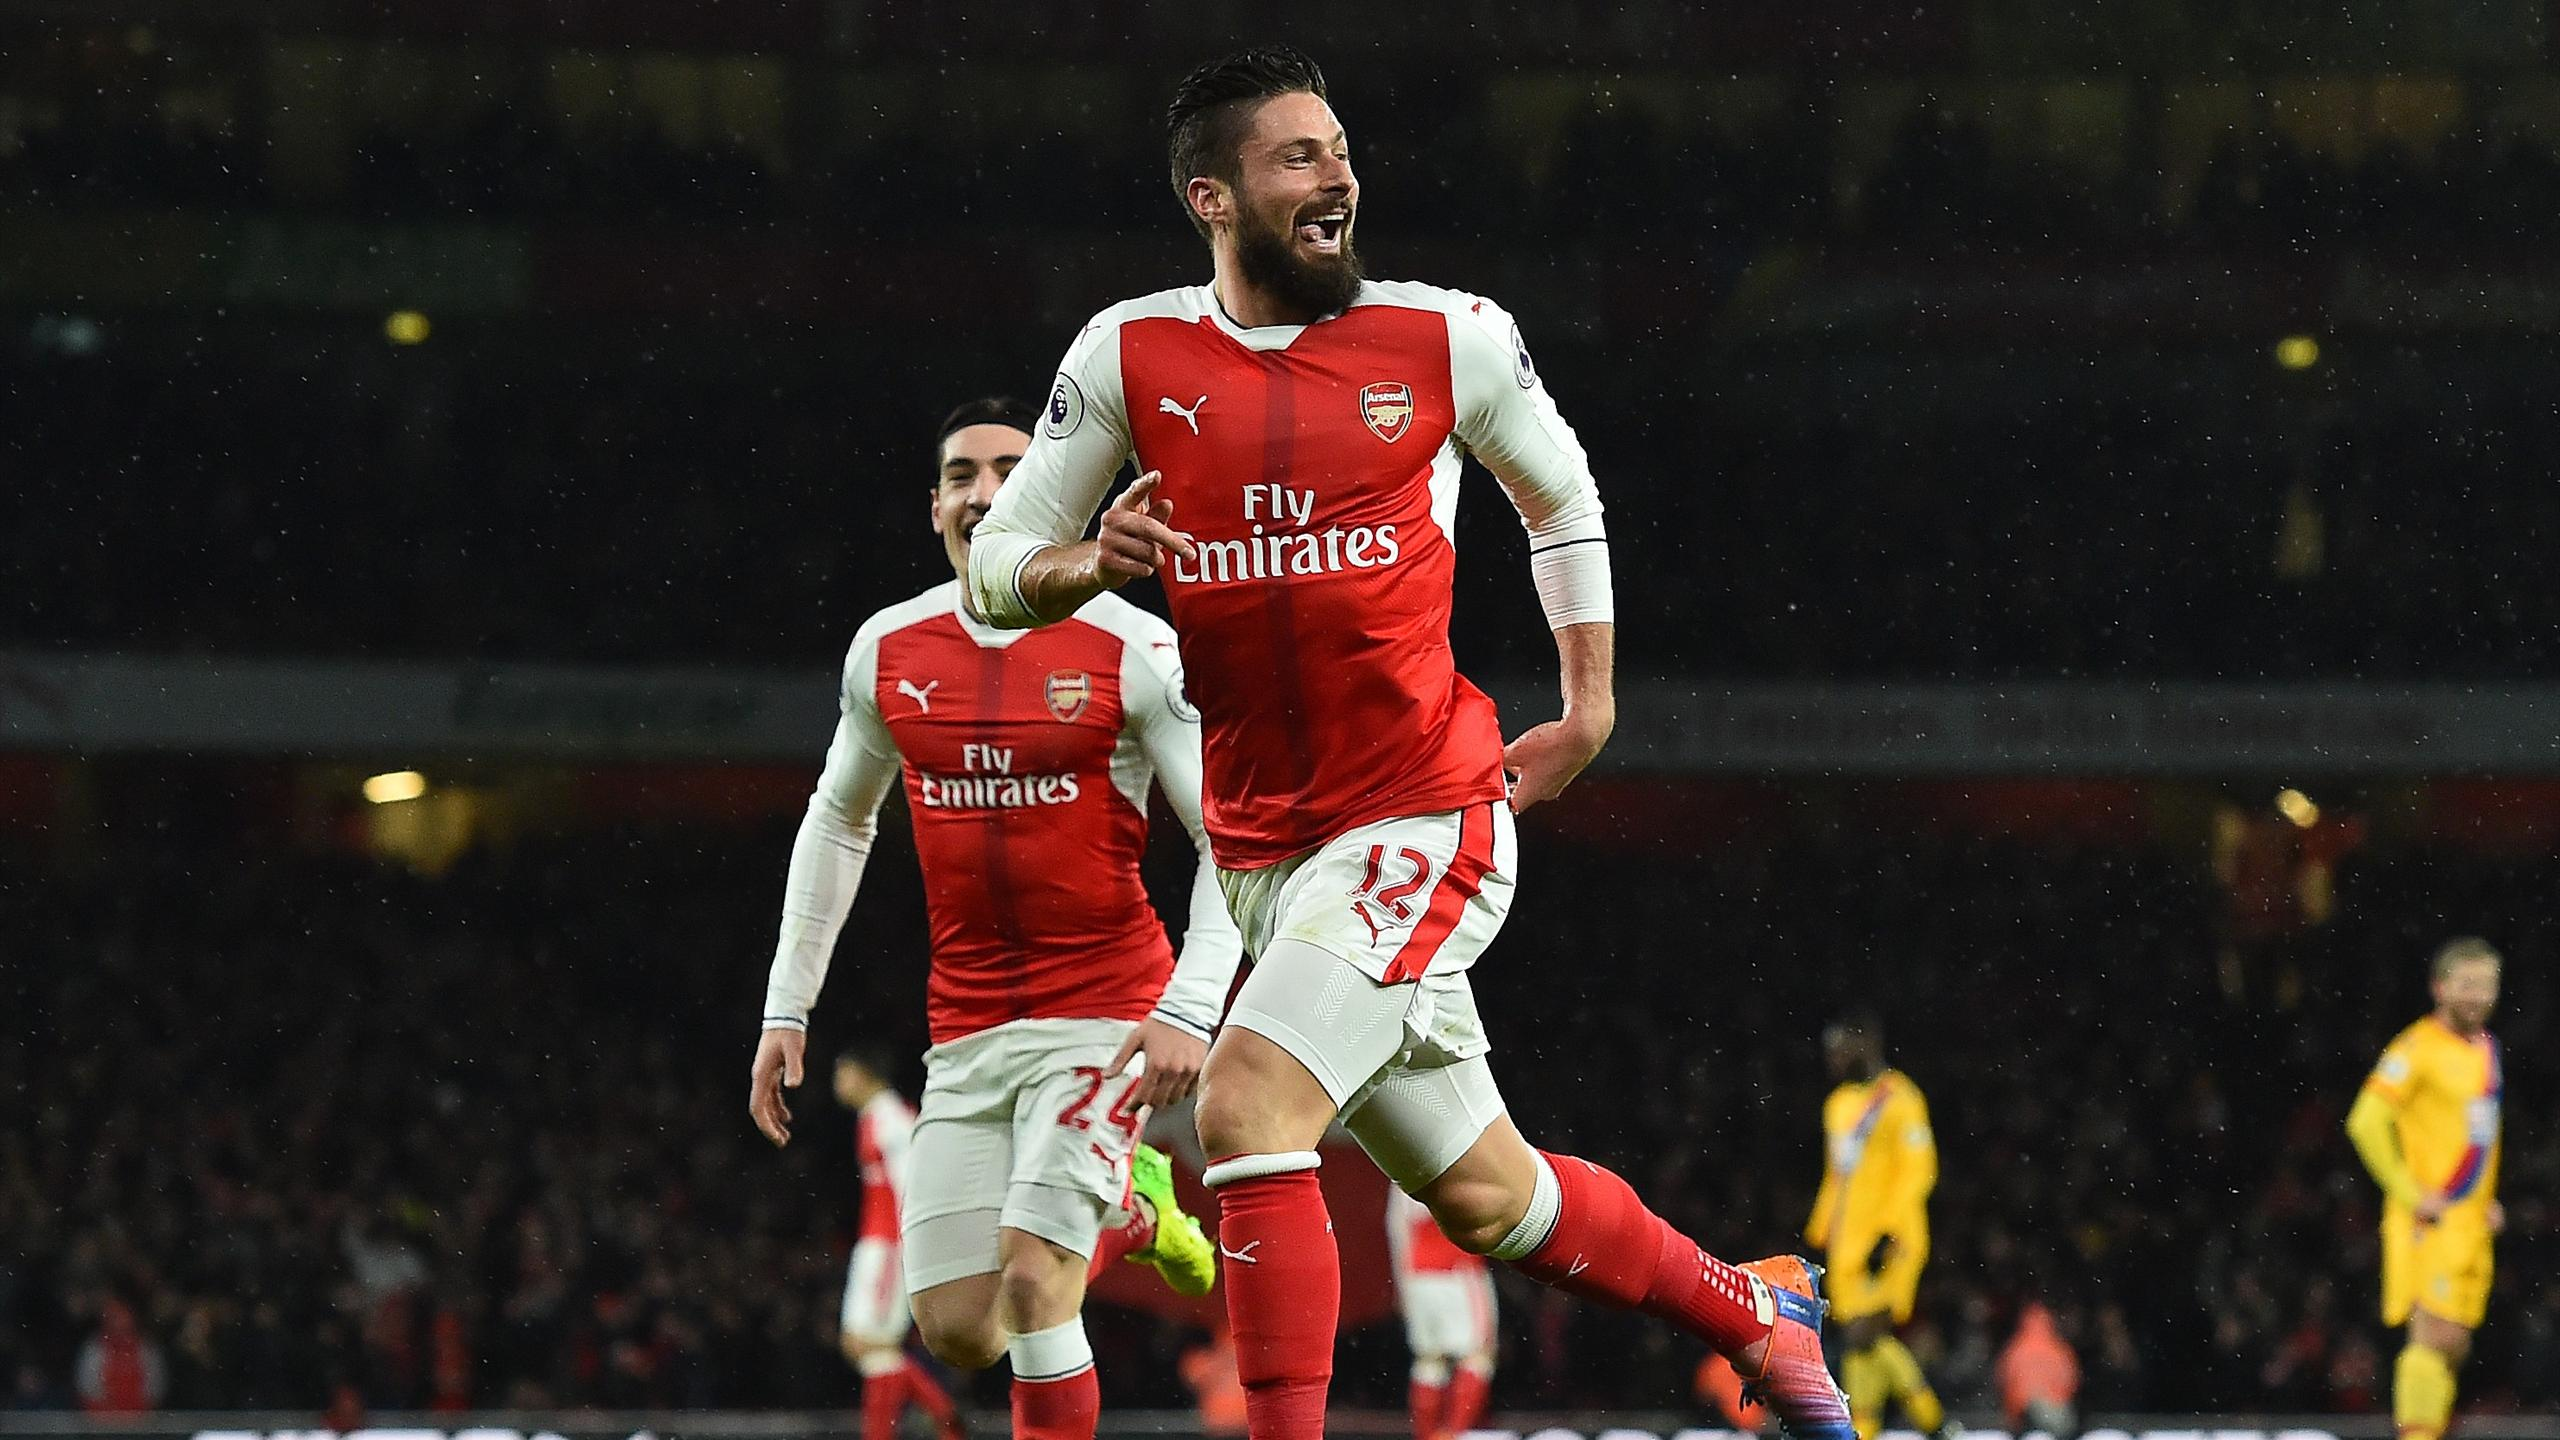 Olivier Giroud (Arsenal), buteur contre Crystal Palace